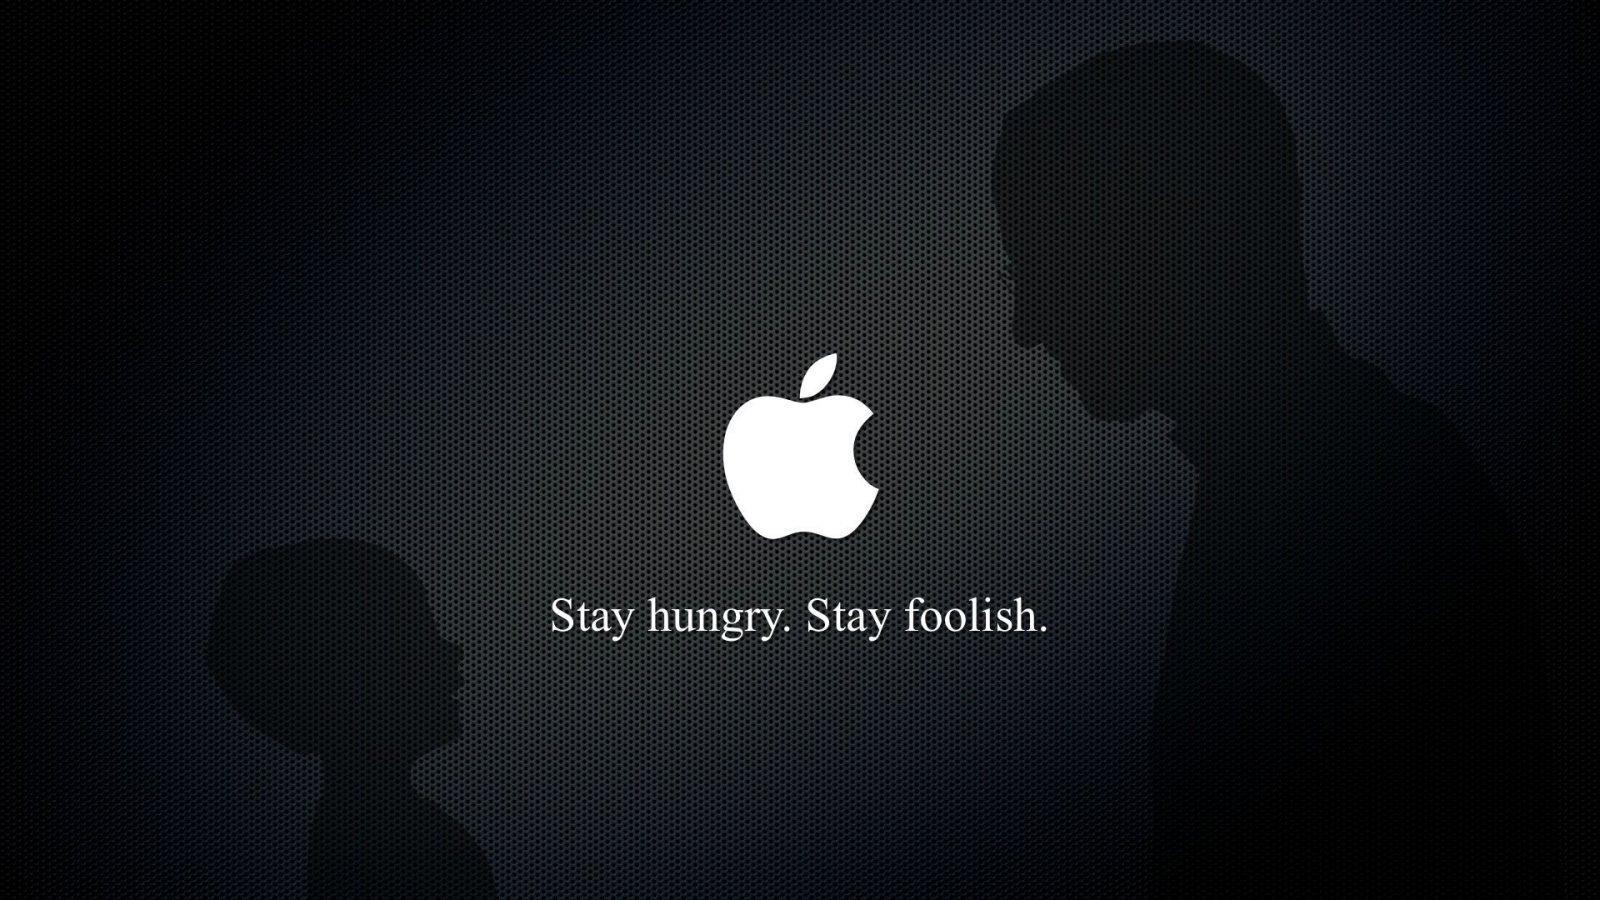 Fantastic Wallpaper Macbook Quote - Steve_Jobs_Stay_Hungry_Stay_Footlish_Apple_Logo_HD_Wallpaper-Vvallpaper  HD_279512.jpg